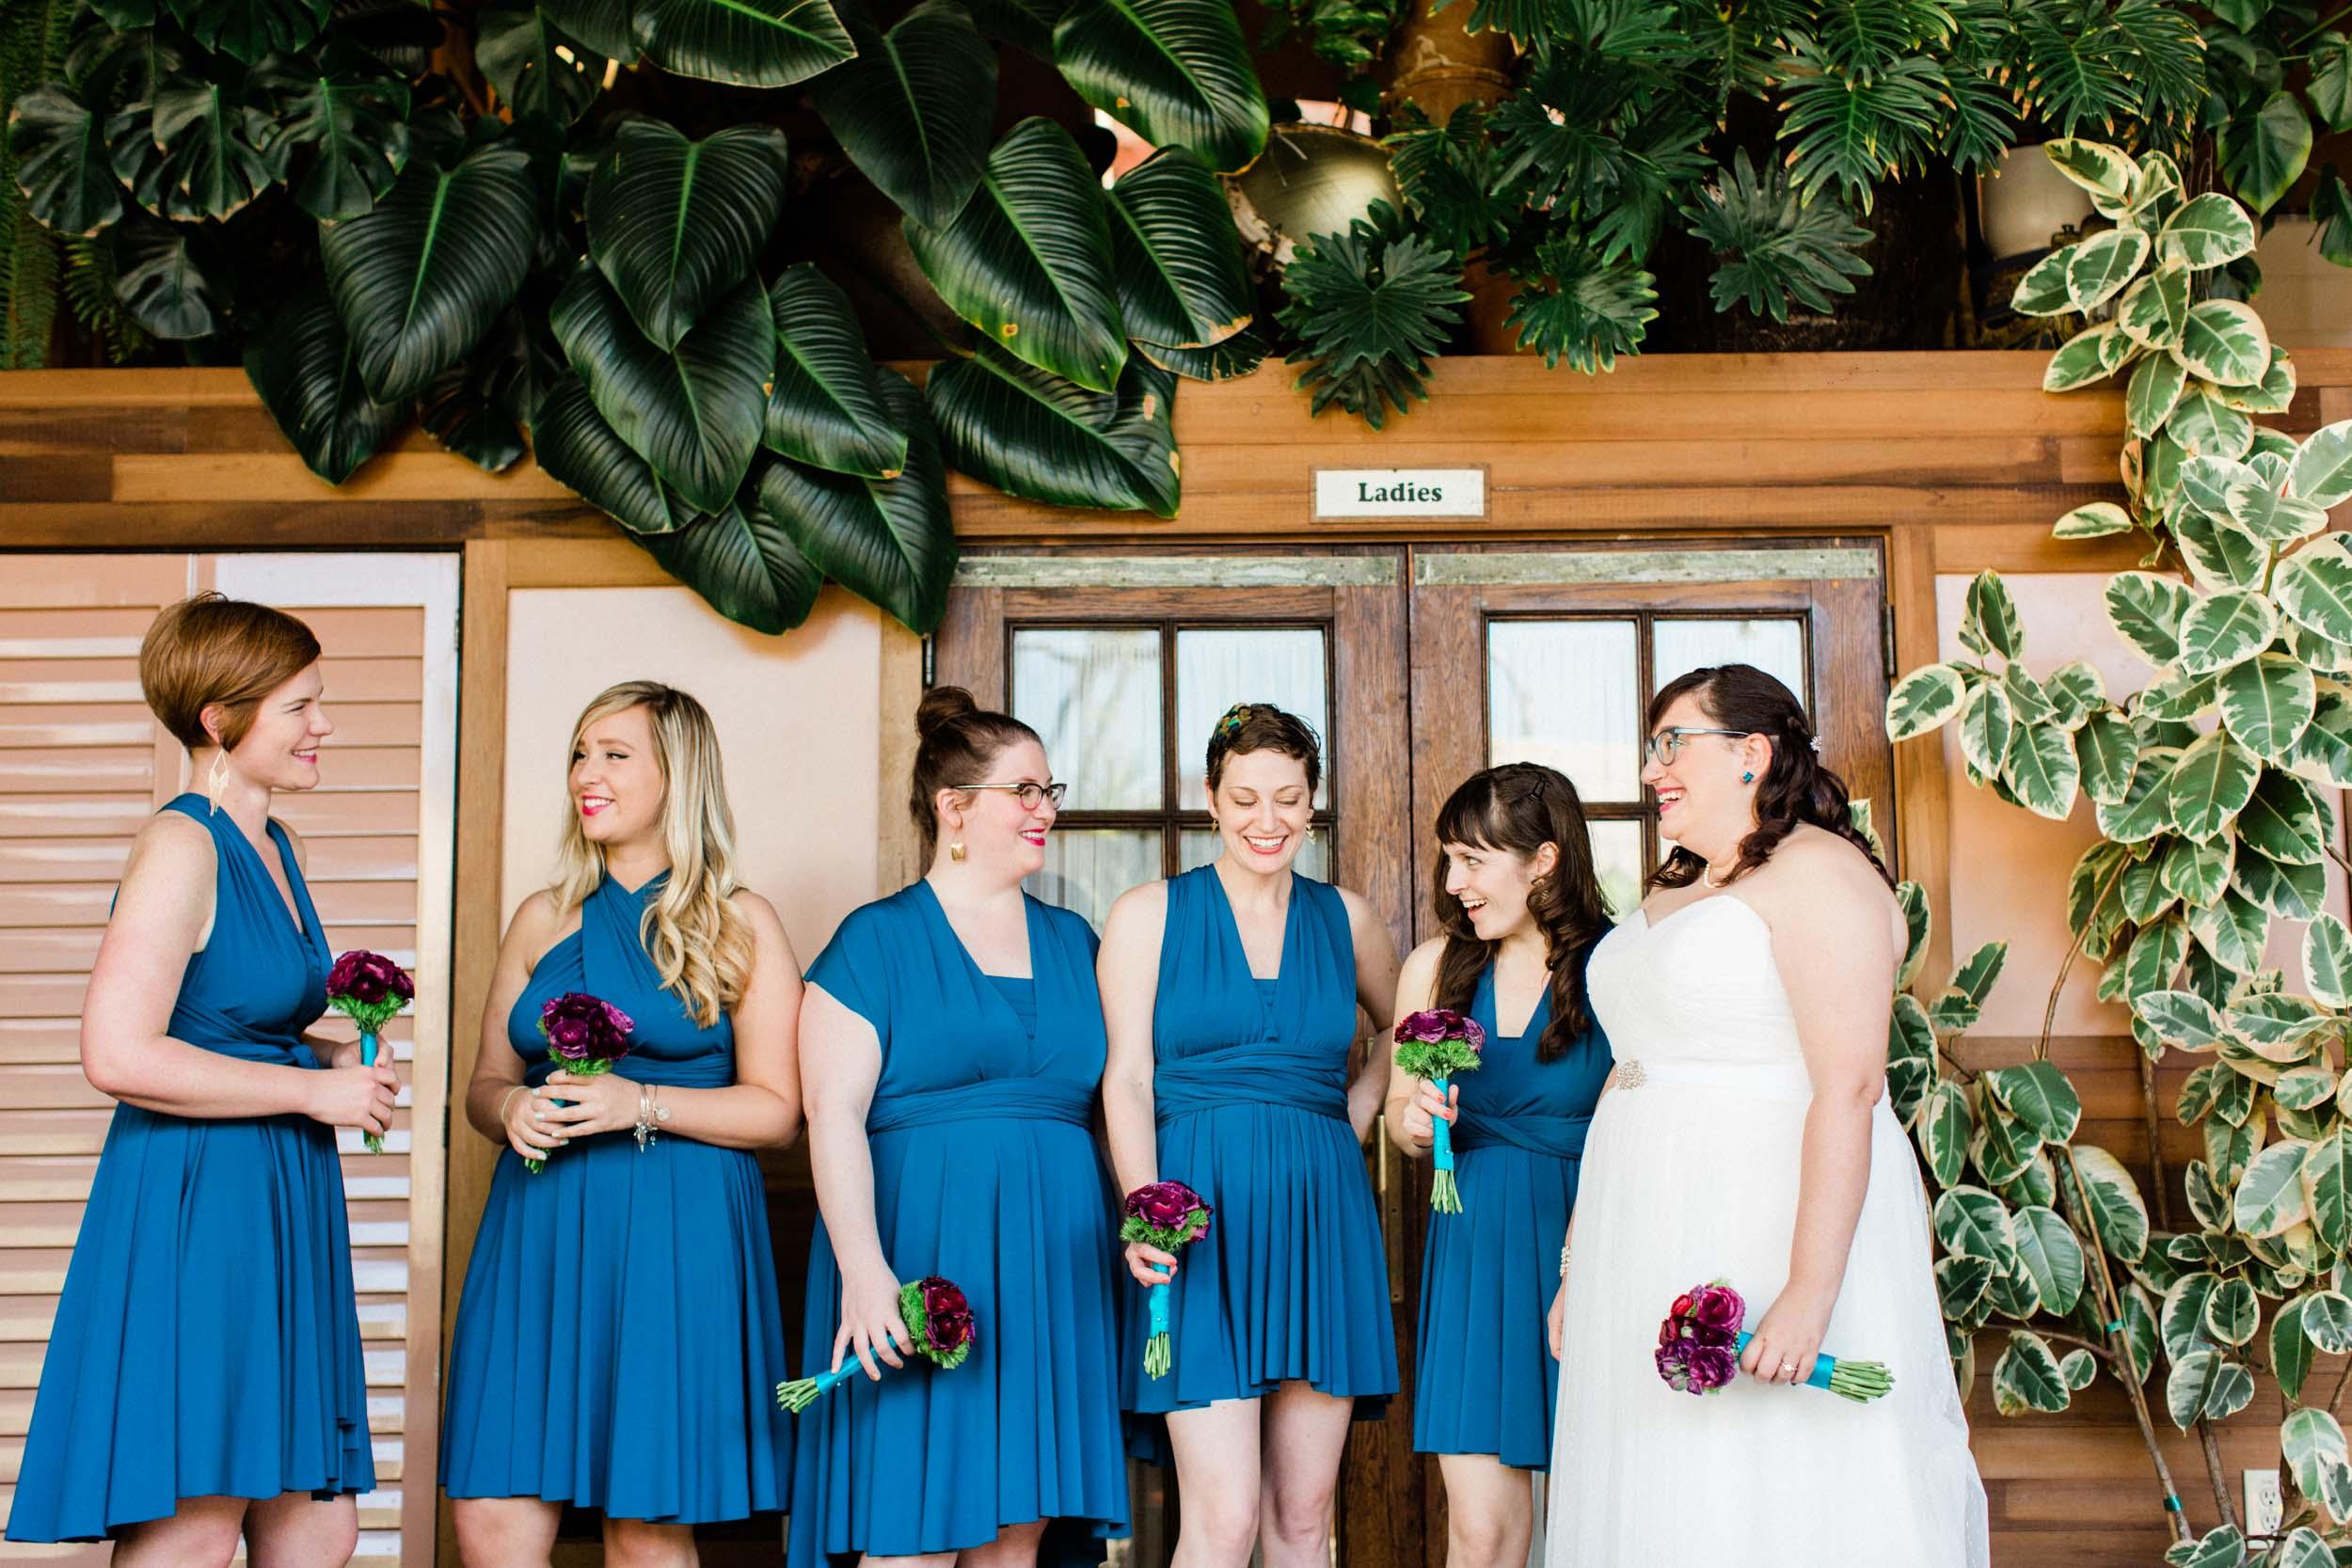 BKM-Photography-Smog-Shoppe-Culver-City-Wedding-Photographer-Culver-Hotel-0016.jpg